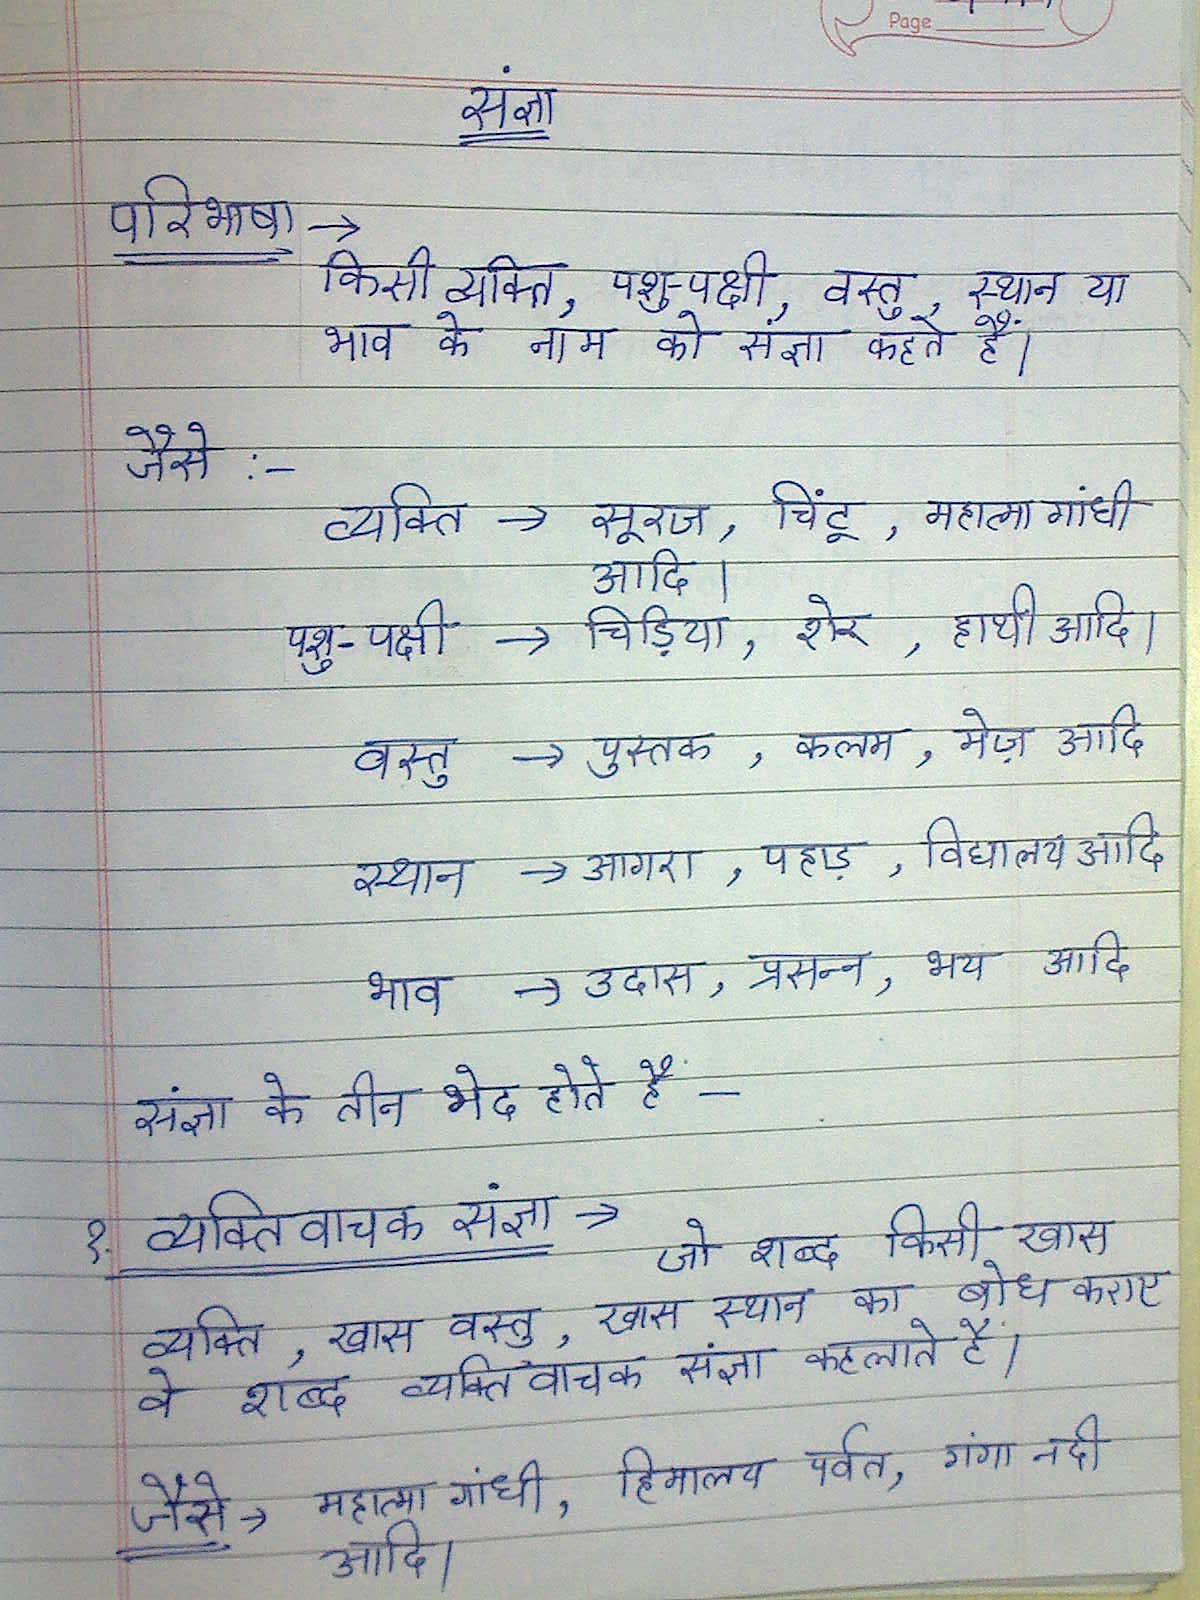 Stars of pis ahmedabad std iii august 2015 for Koi 5 anopcharik patra